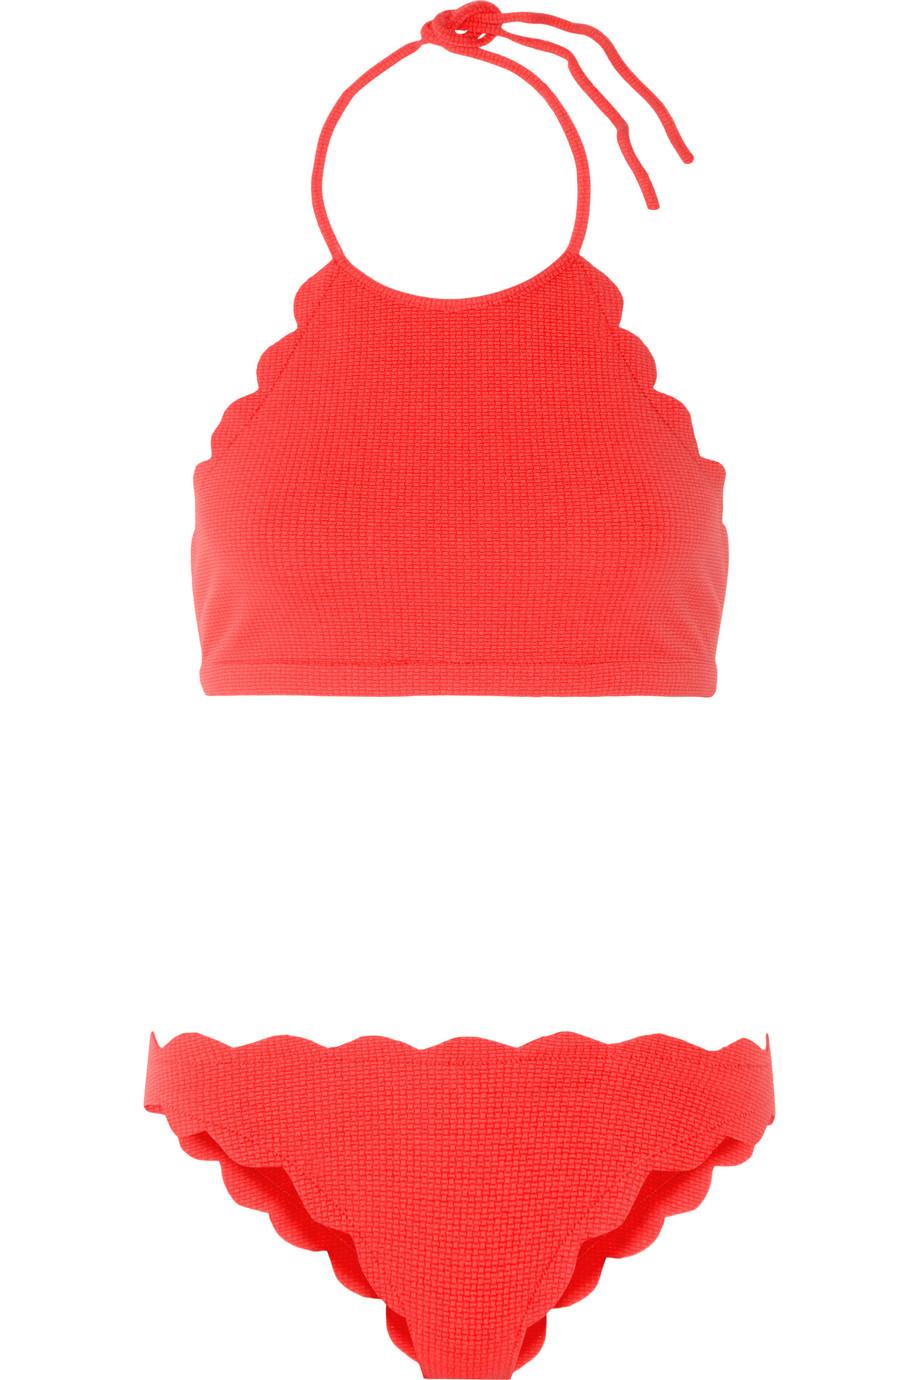 Marysia Mott and Antibes Scalloped Halterneck Bikini, Red, Women's, Size: XS